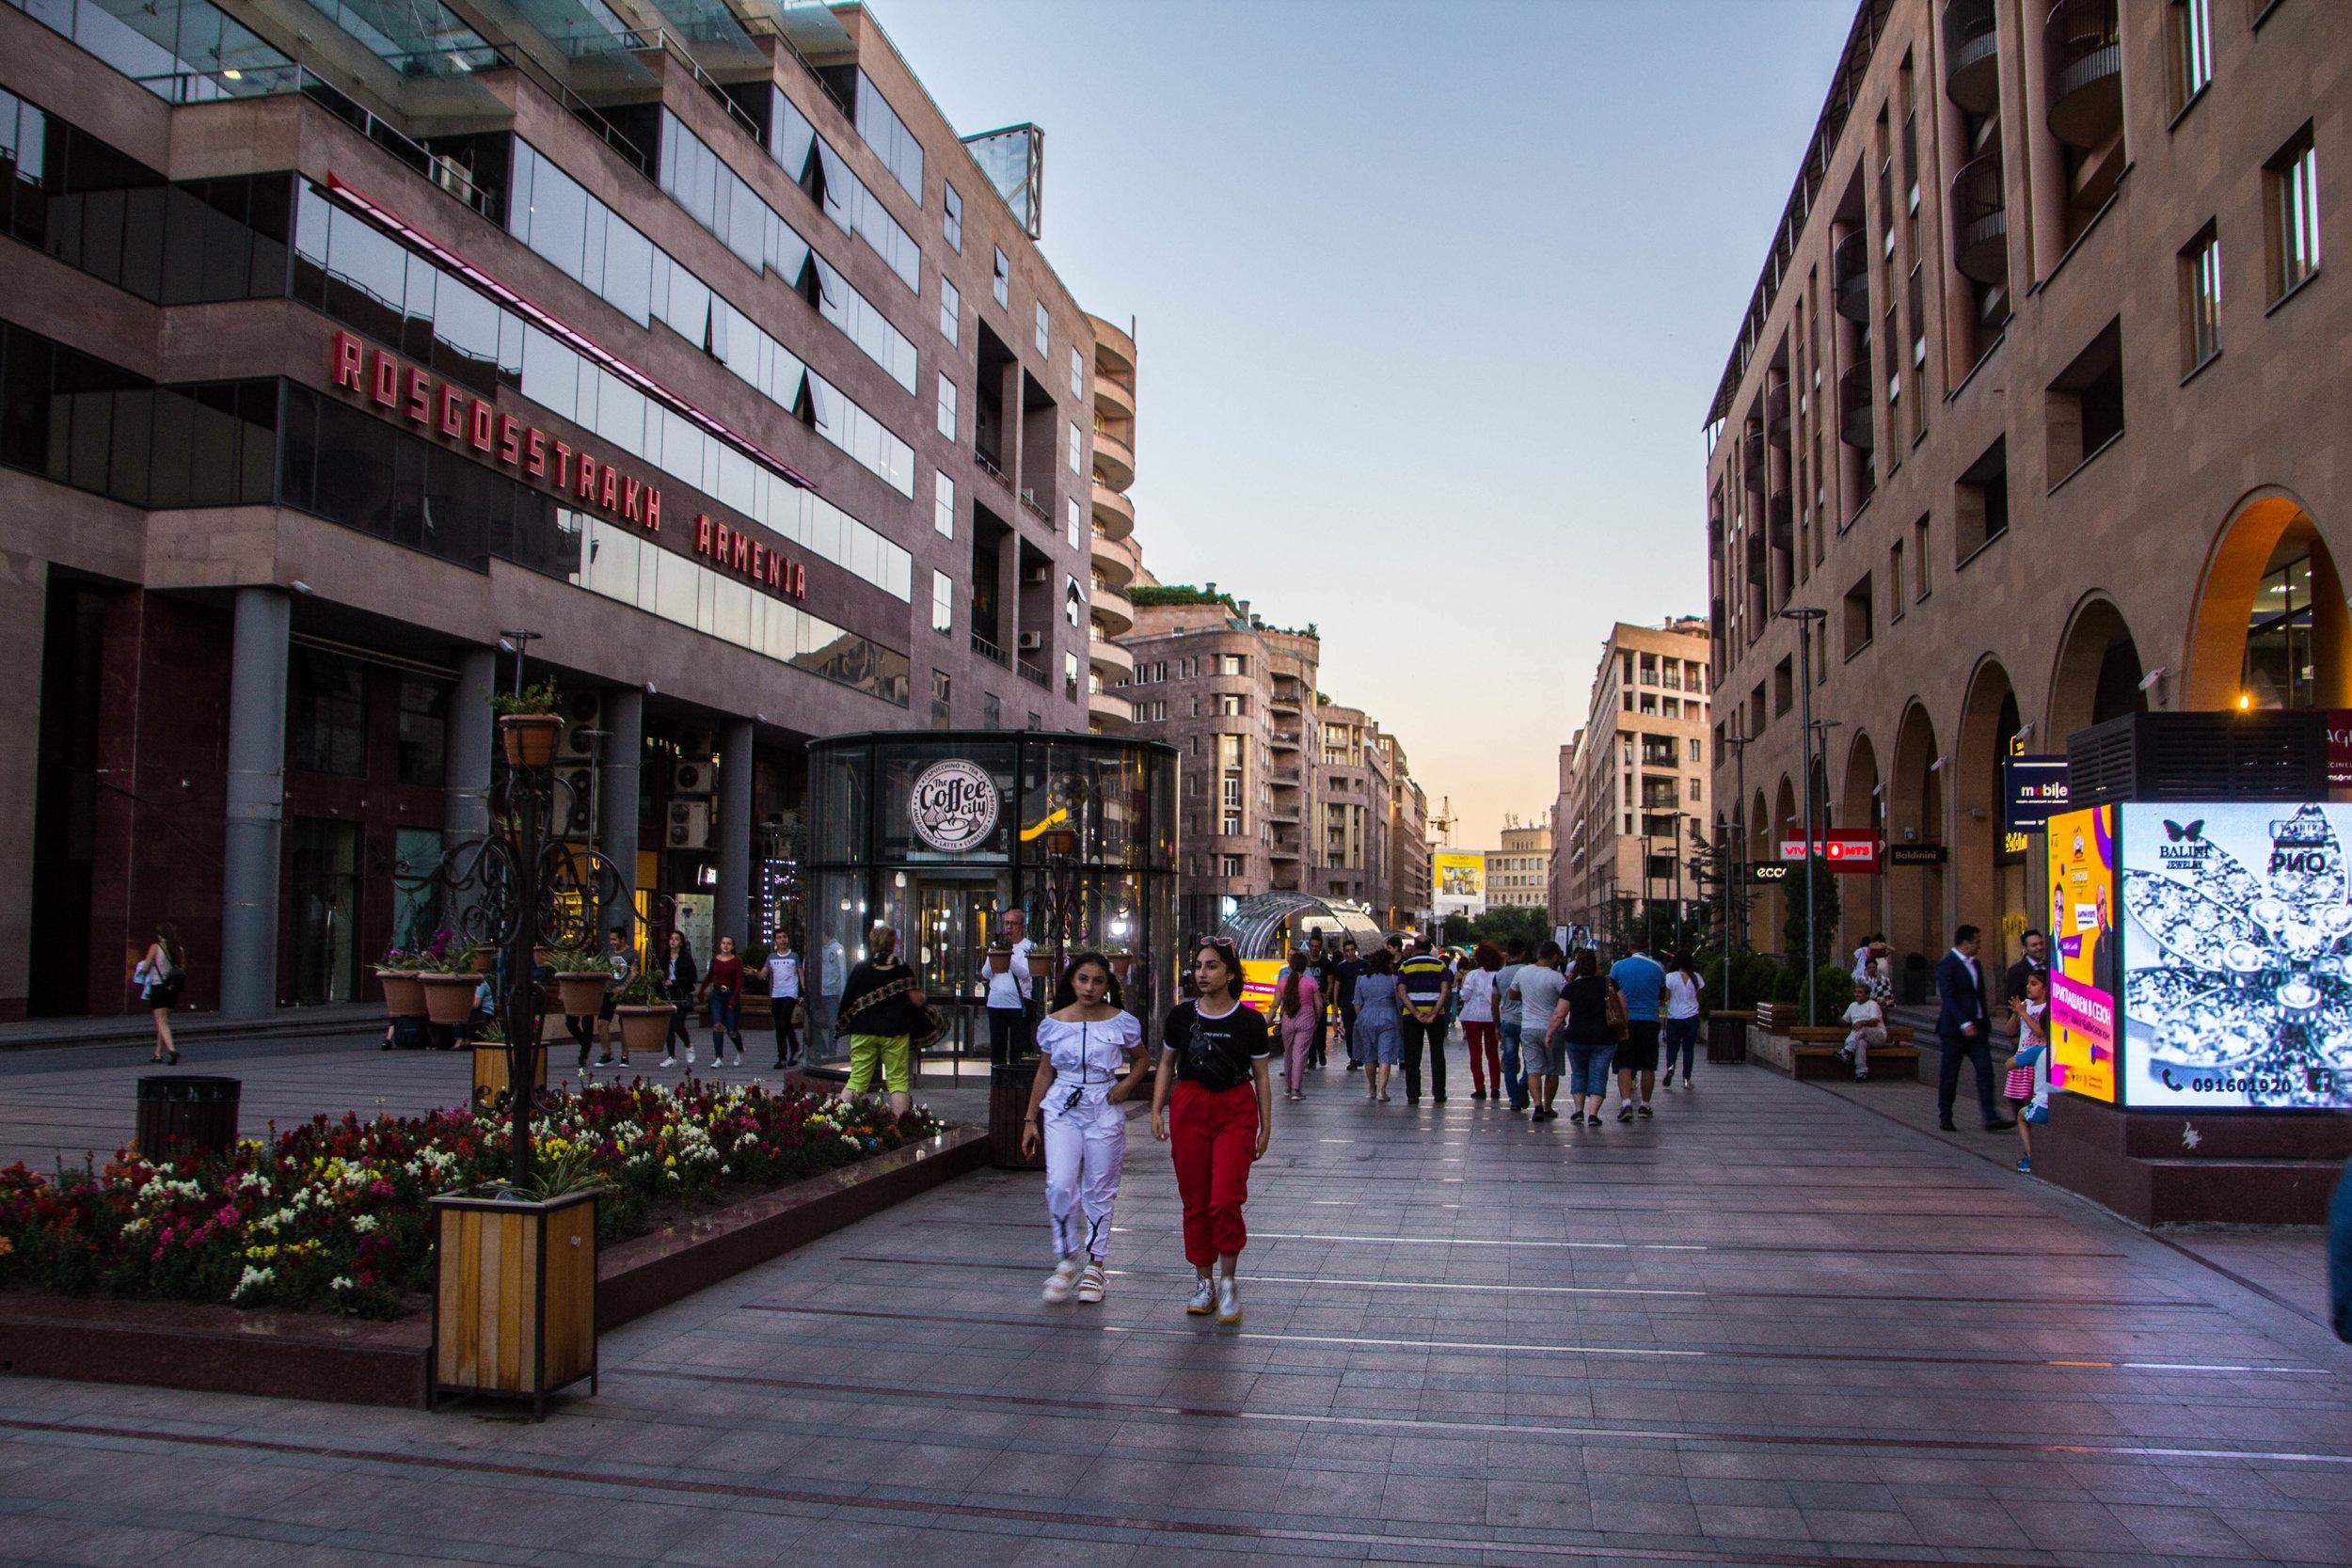 yerevan-armenia-streets-3-10.jpg